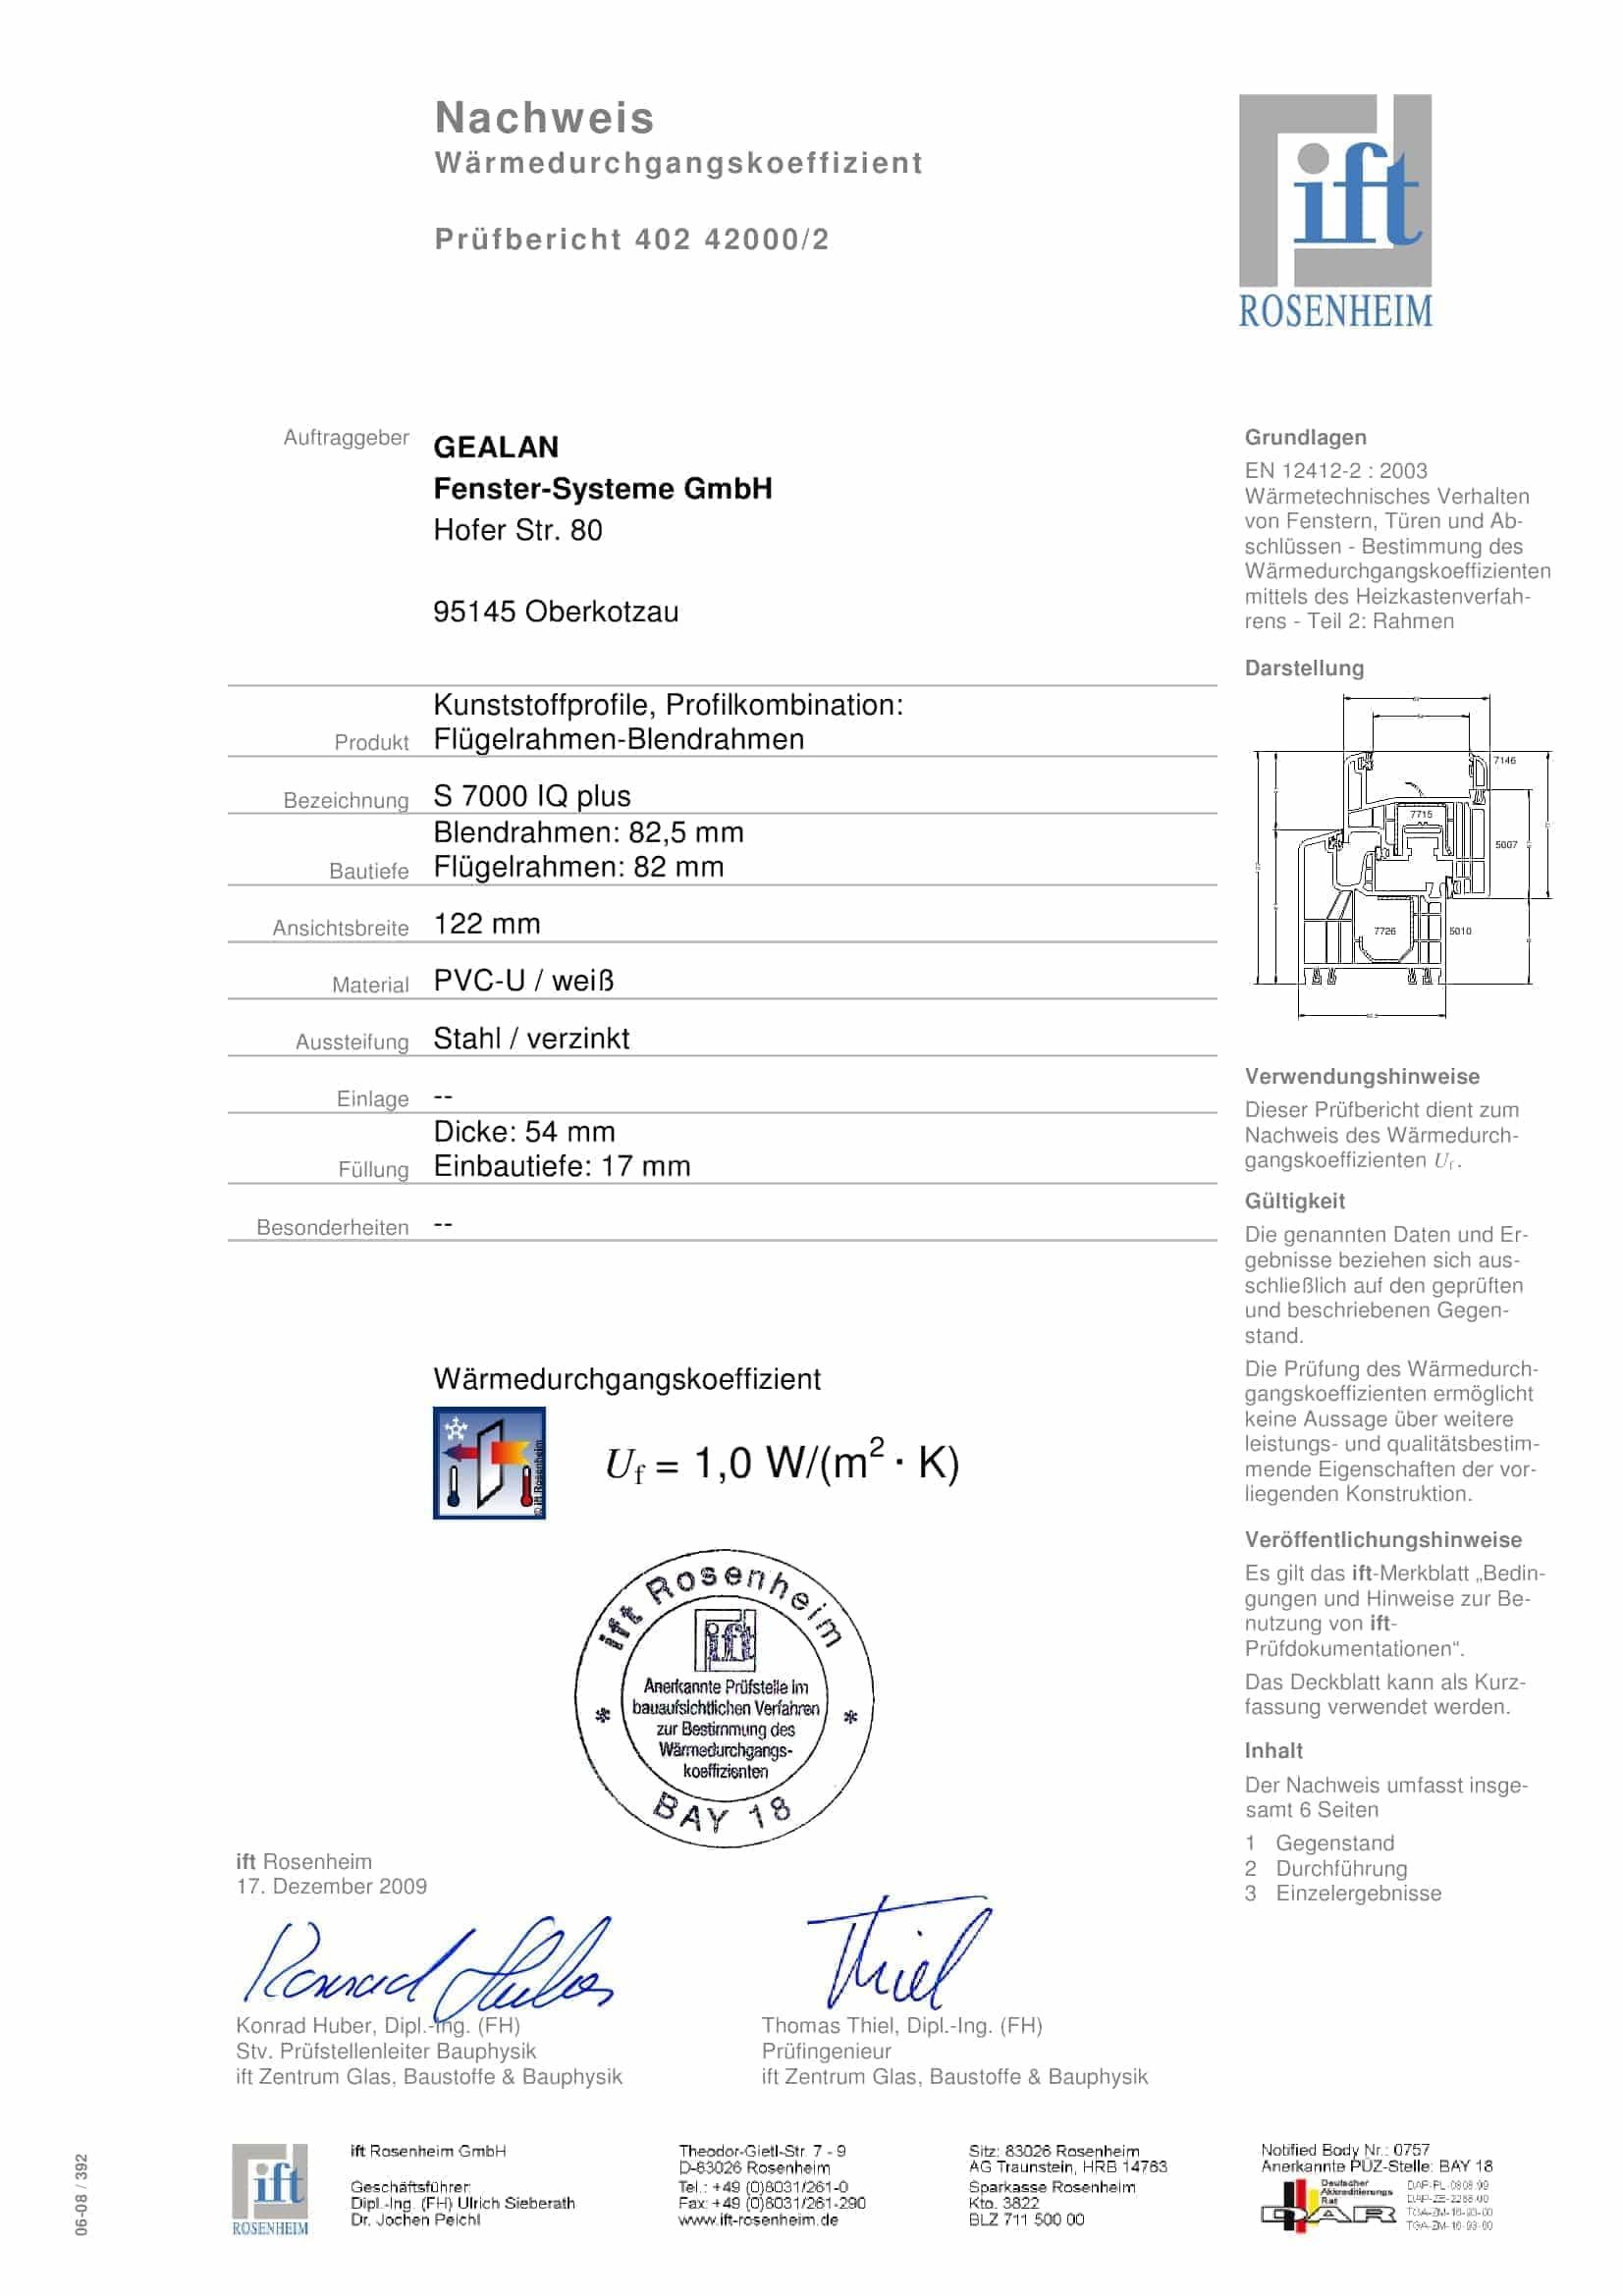 Kunststoffprofile, Profilkombination: Flügelrahmen-Blendrahmen